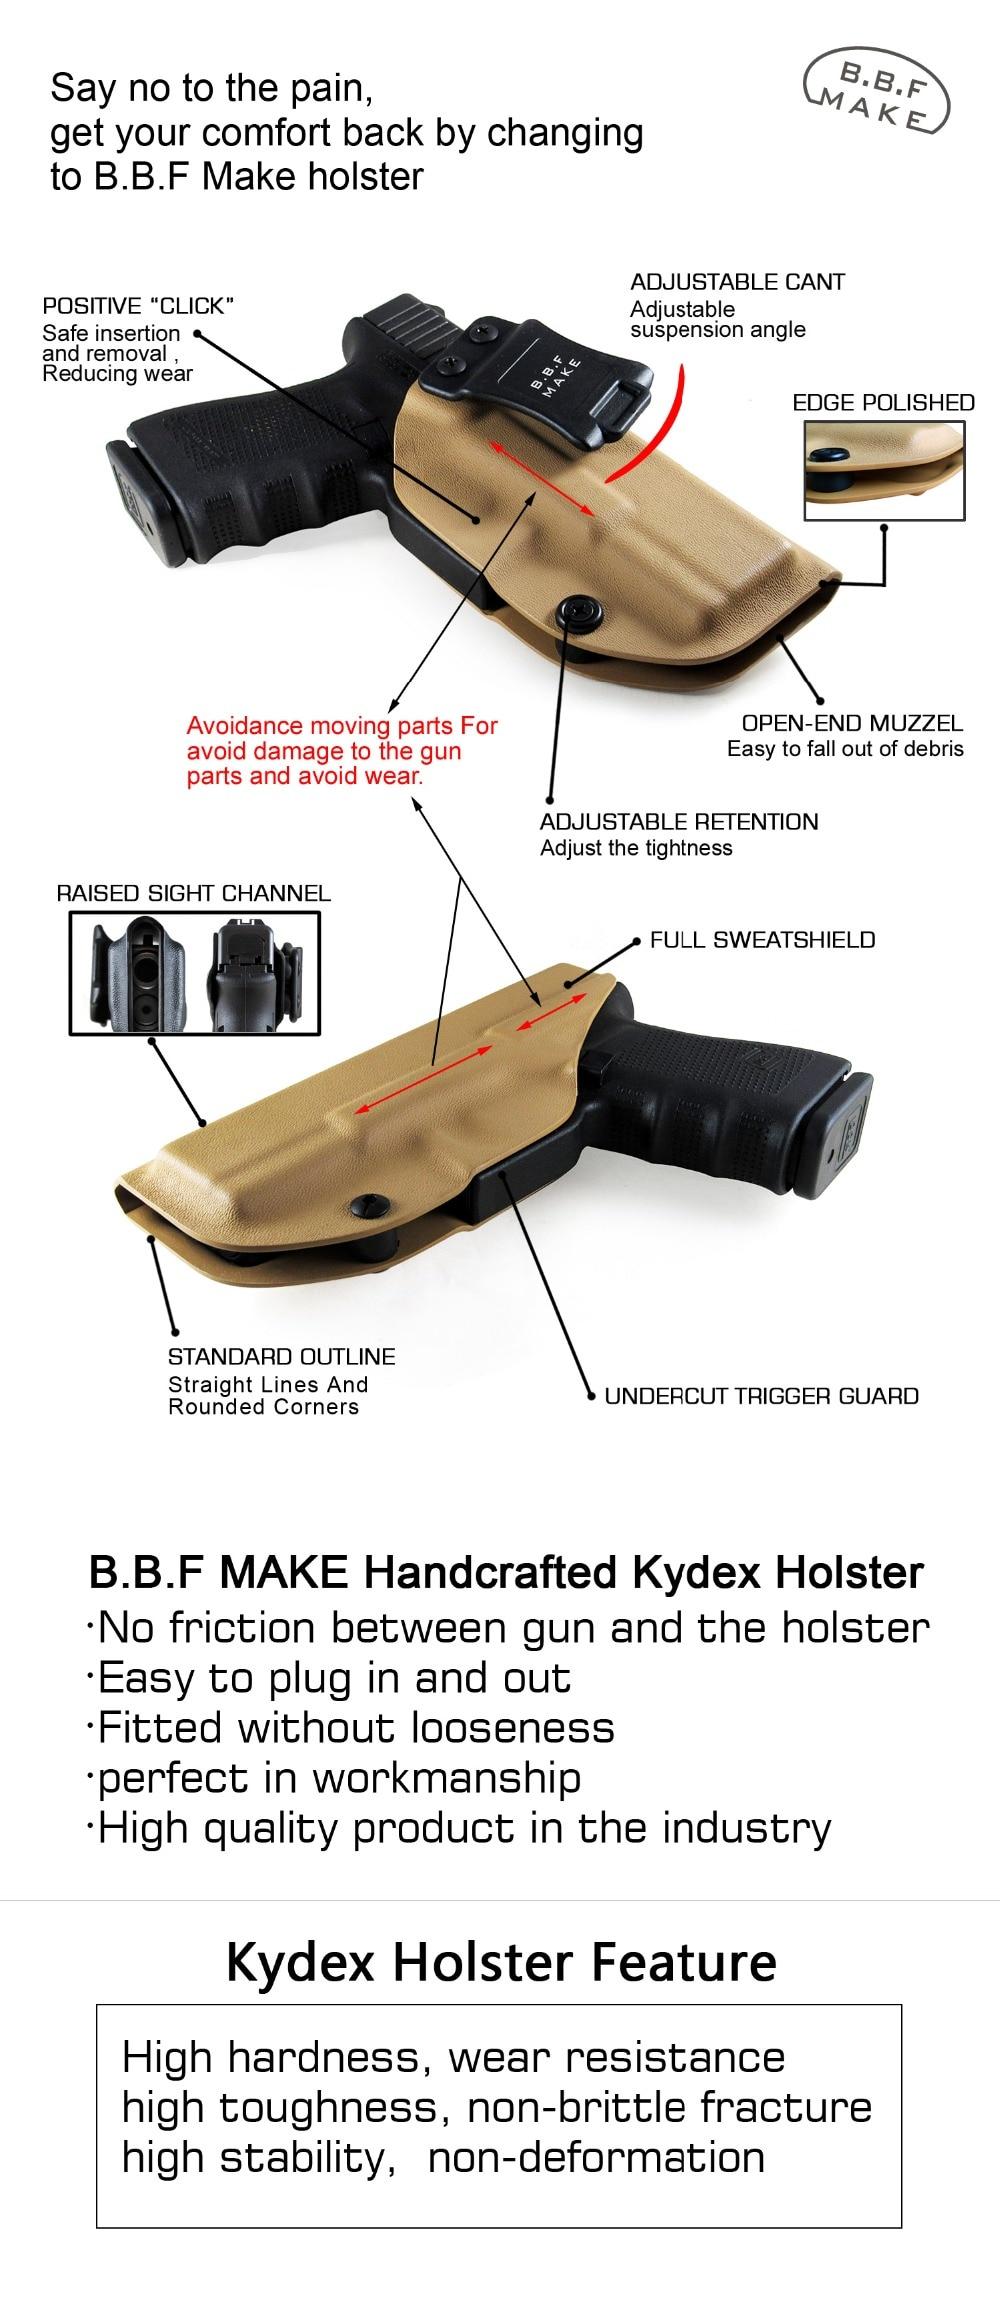 B B F Make IWB KYDEX Gun Holster Fits: Taurus PT111 G2C / PT140 Pistol Case  Inside Concealed Carry Guns Pouch Accessories Bags